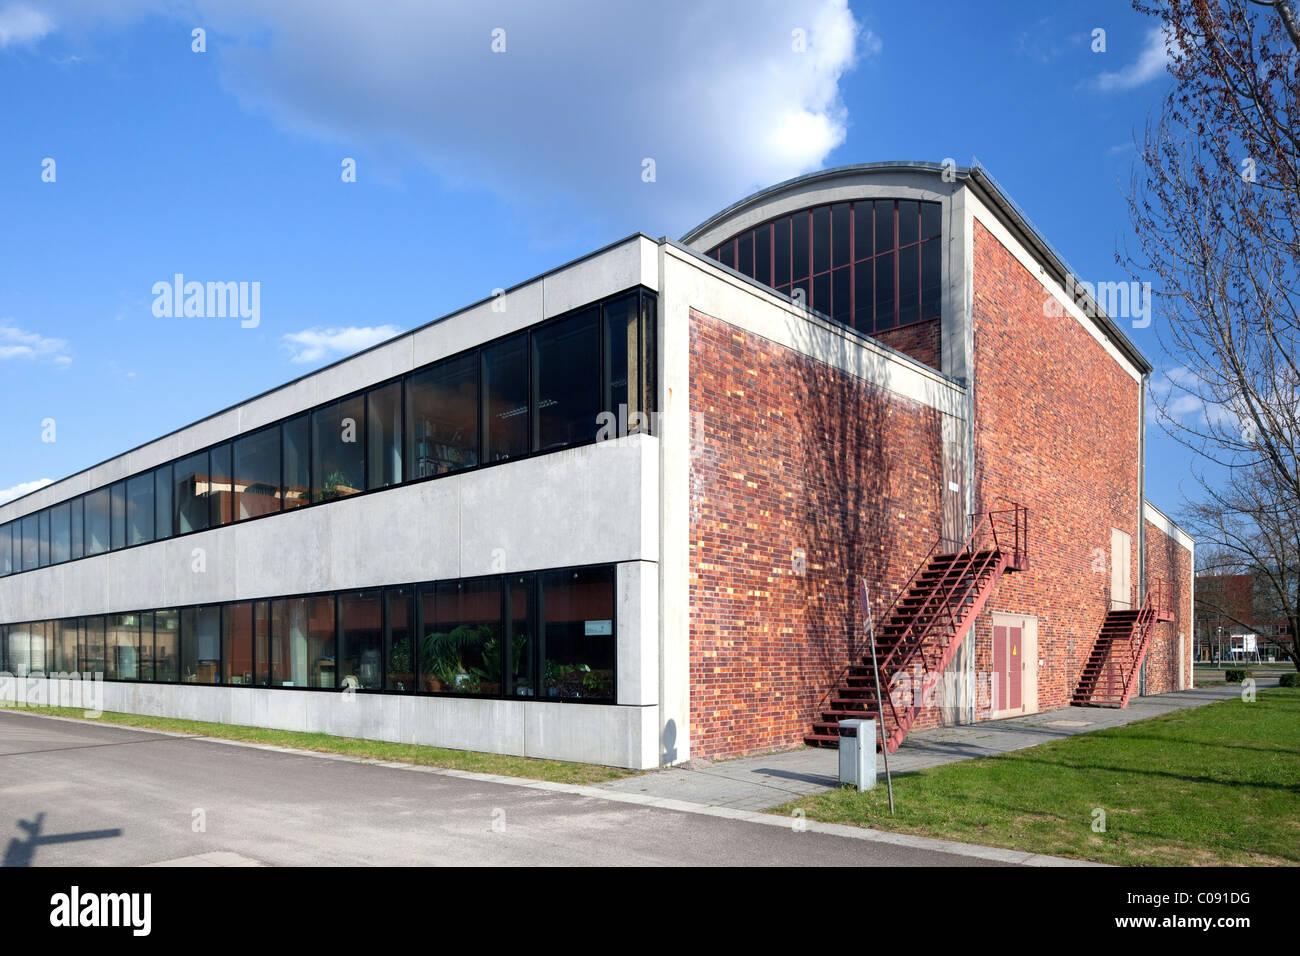 Hangar of the former Johannisthal airfield, Humboldt-University, Adlershof Science City, Berlin, Germany, Europe Stock Photo